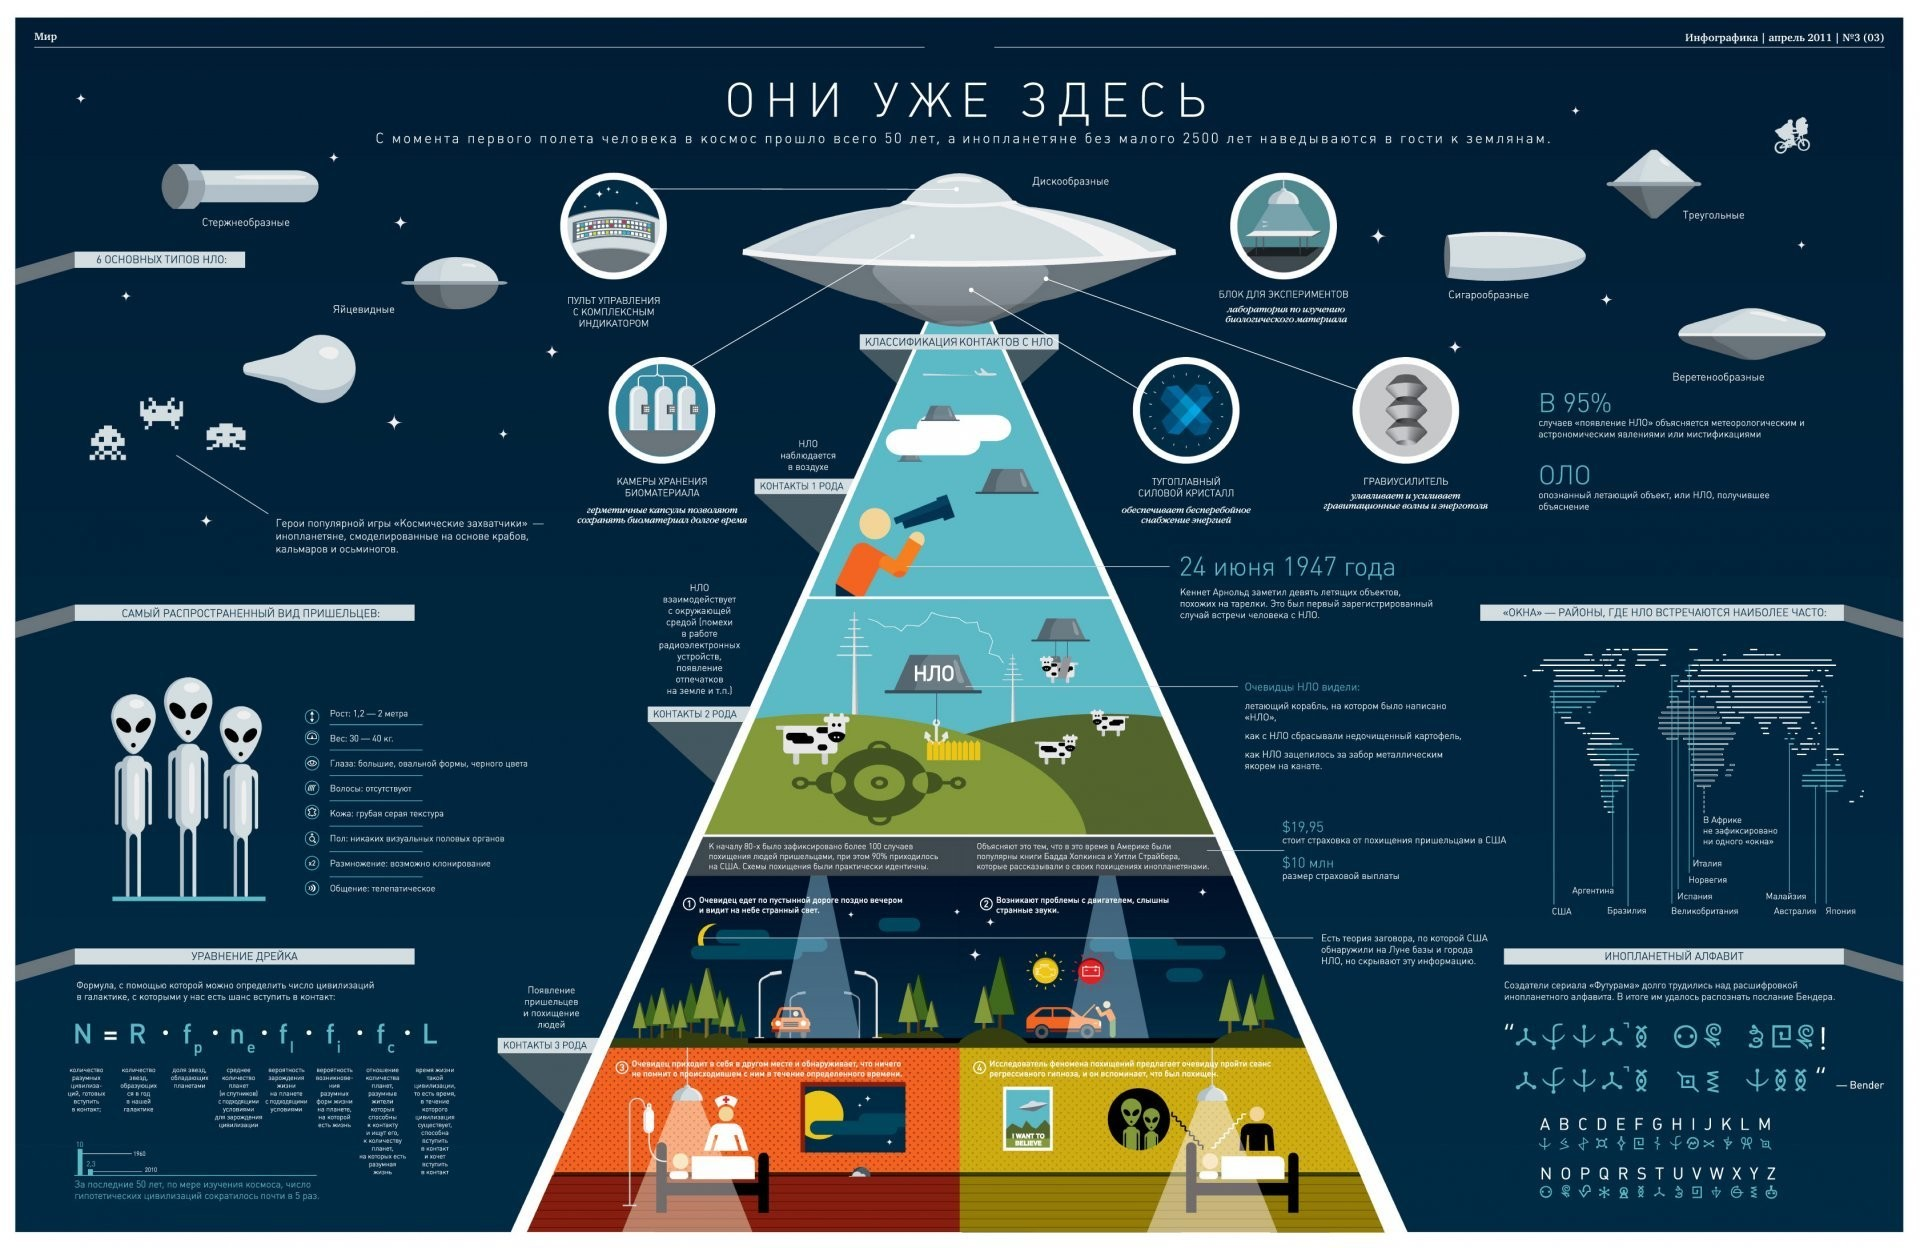 ufo aliens table humanoids